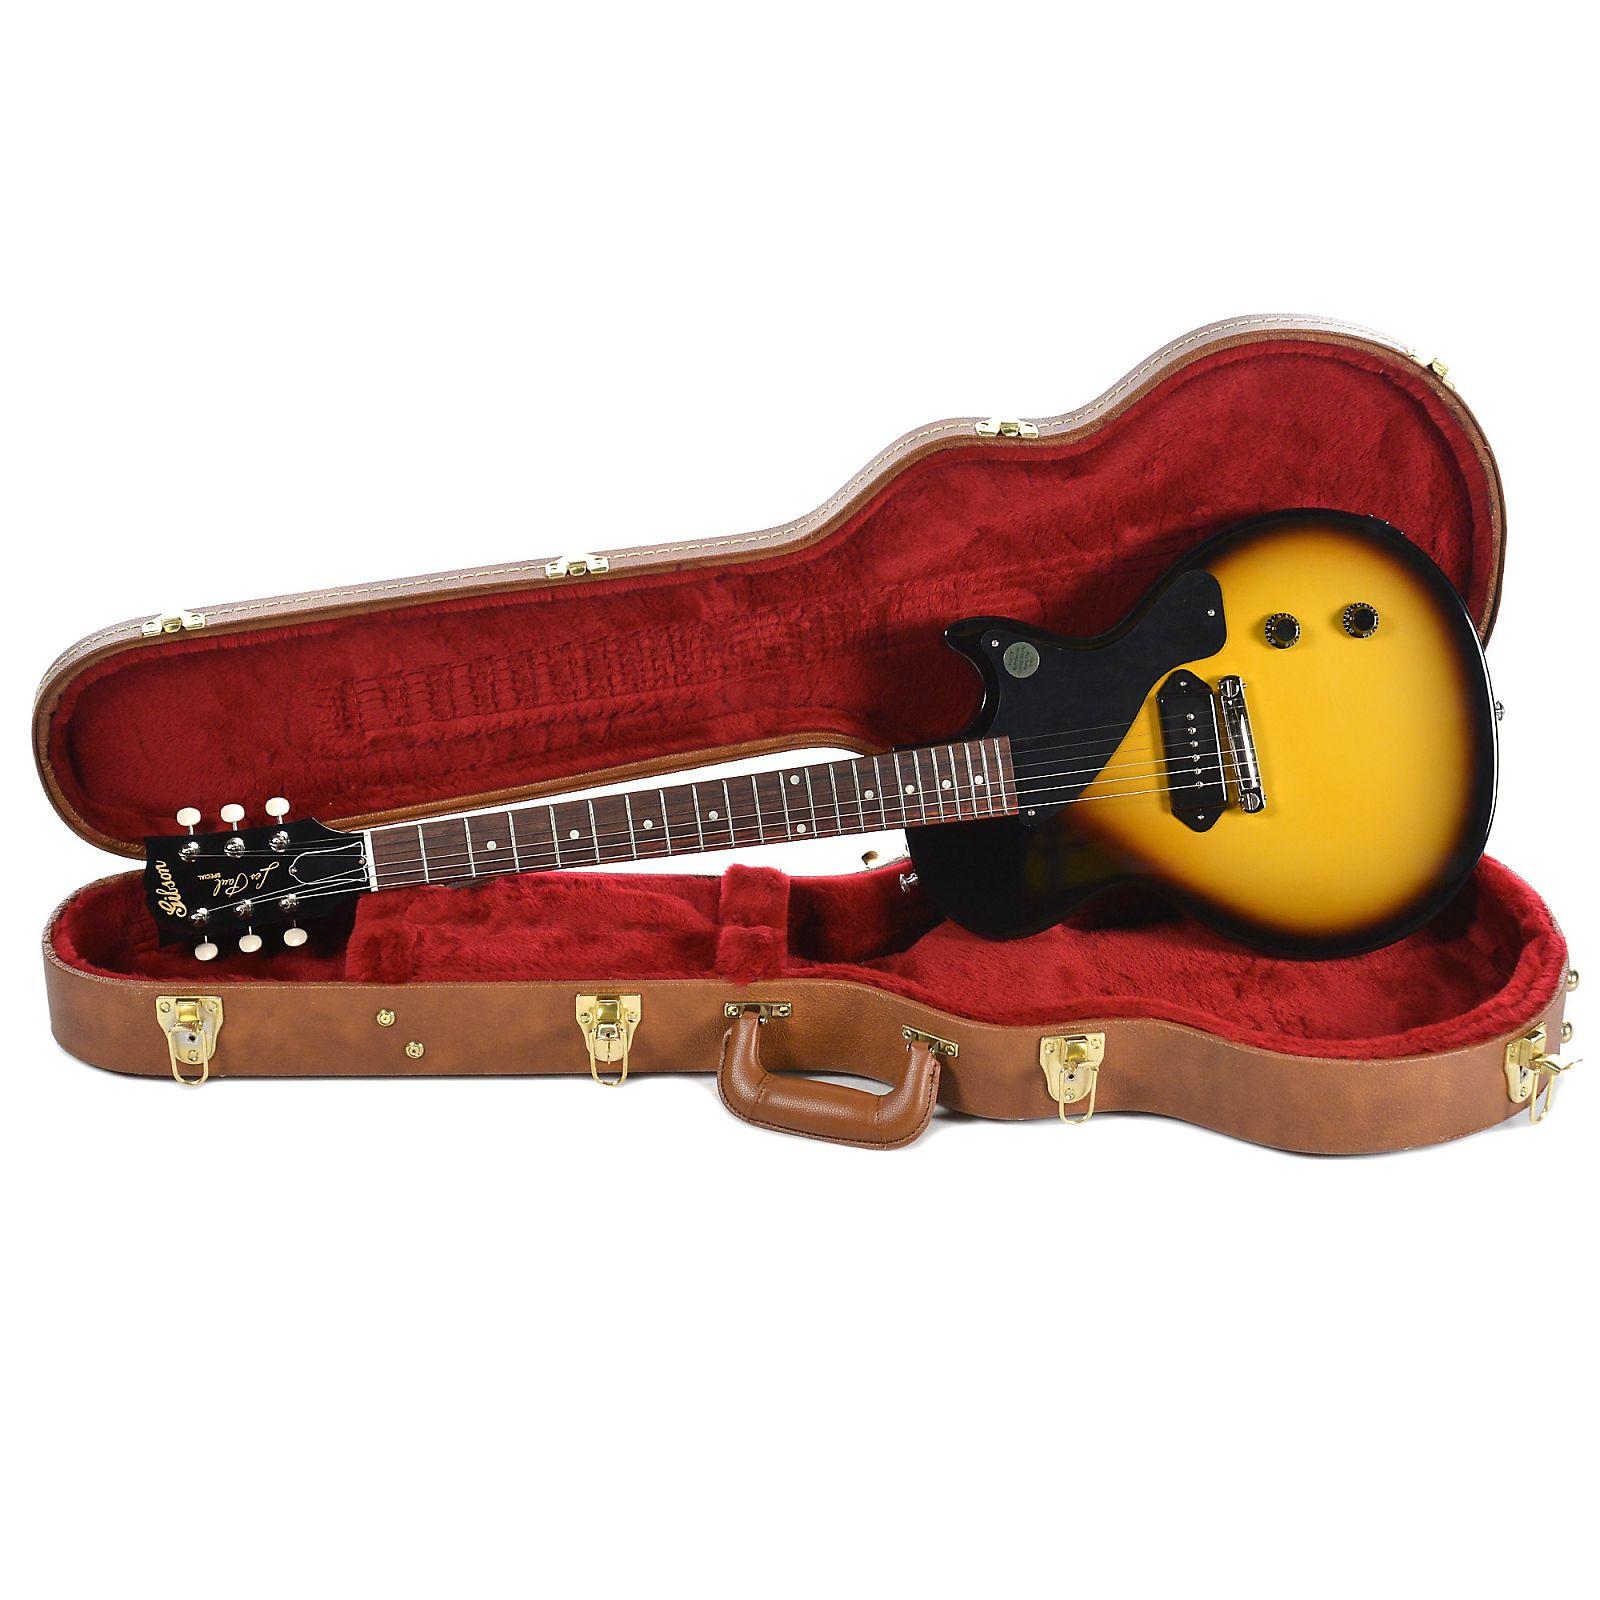 Gibson Usa Les Paul Junior 2018 Vintage Sunburst Classic Plus Electric Guitar The